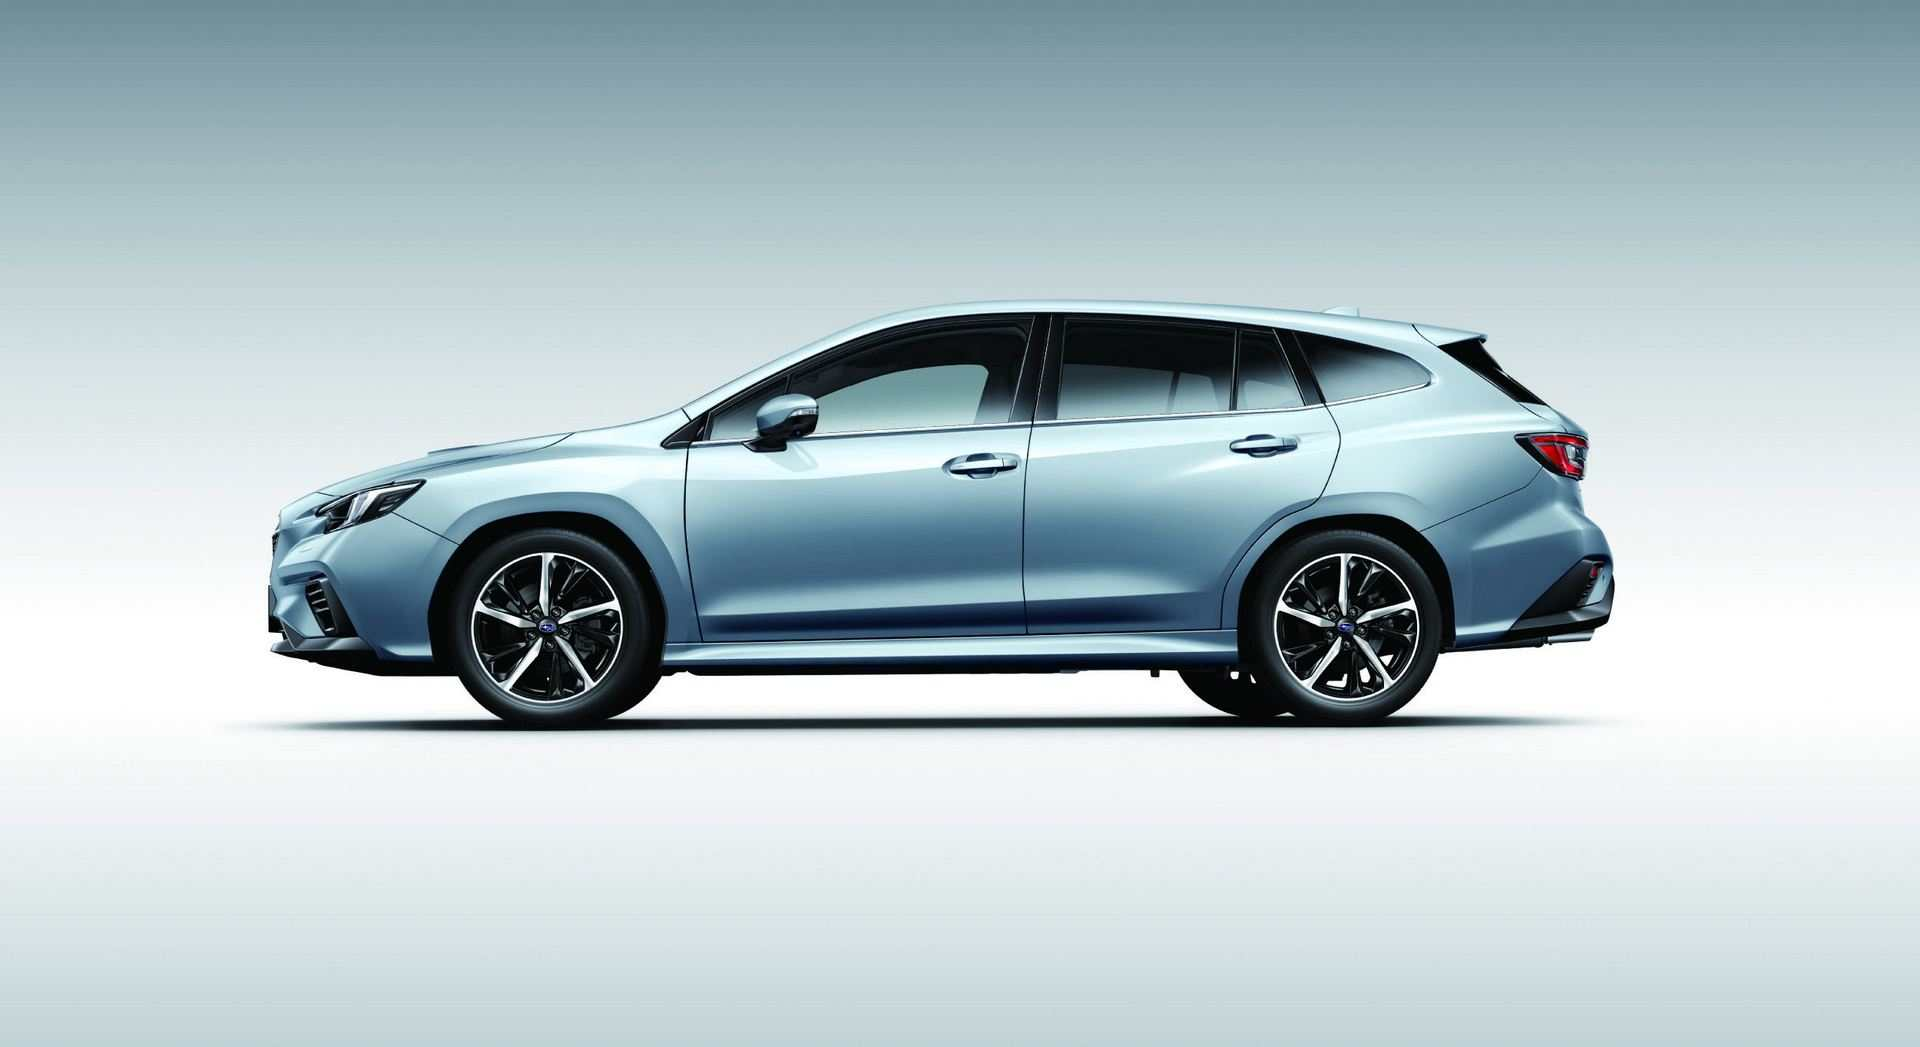 2021_Subaru_Levorg_0129